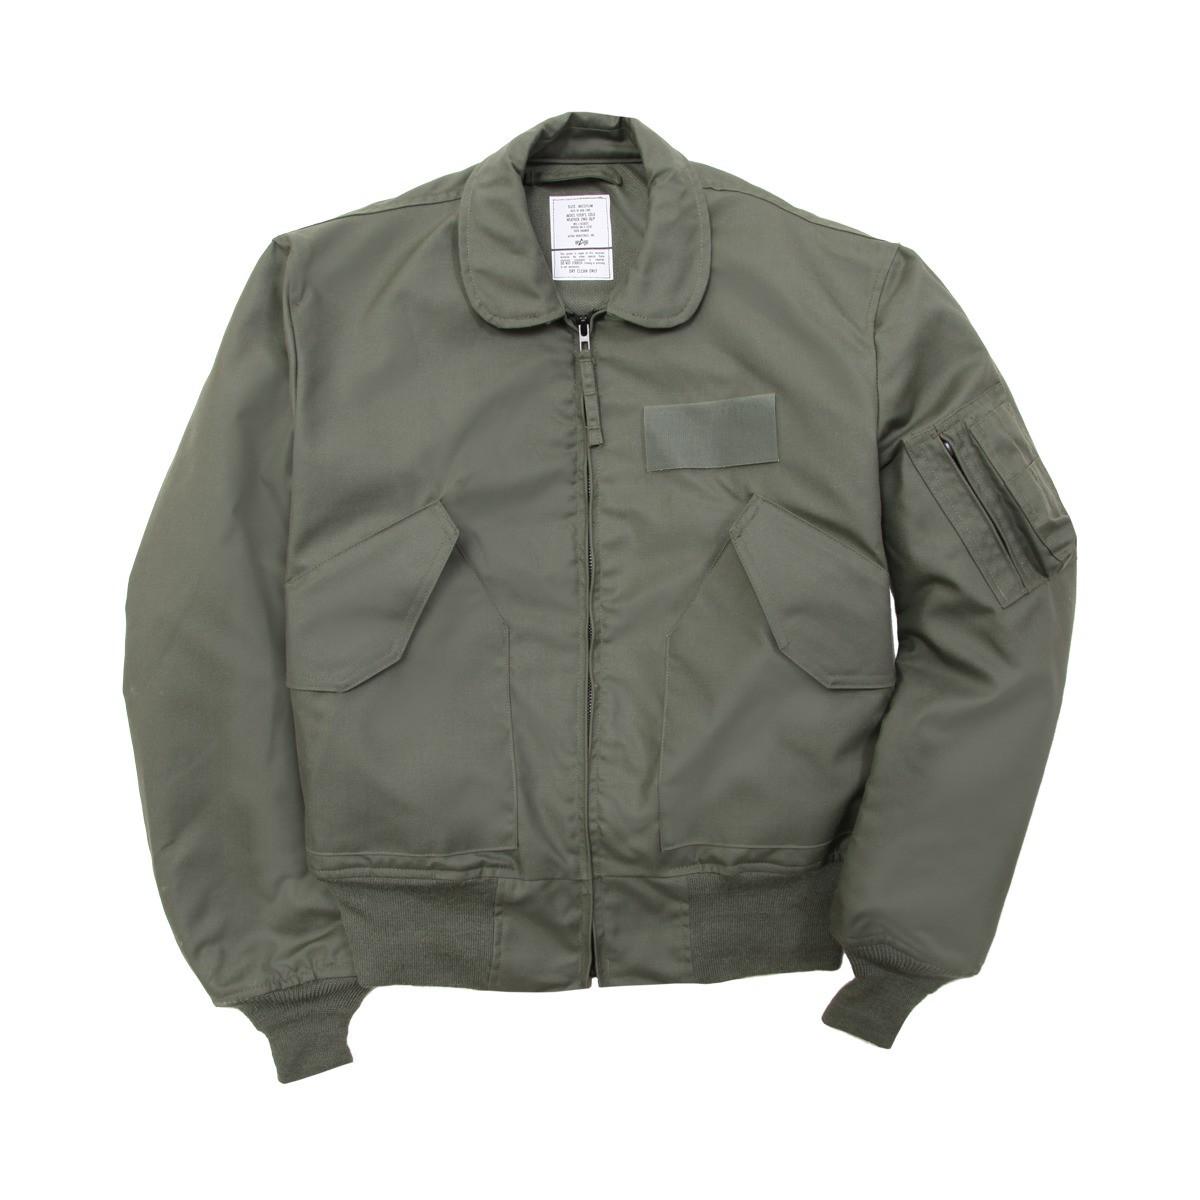 4809b722178 ... CWU 36 P Nomex Mil Spec Flight Jacket Sage Green USA Made. Image 1